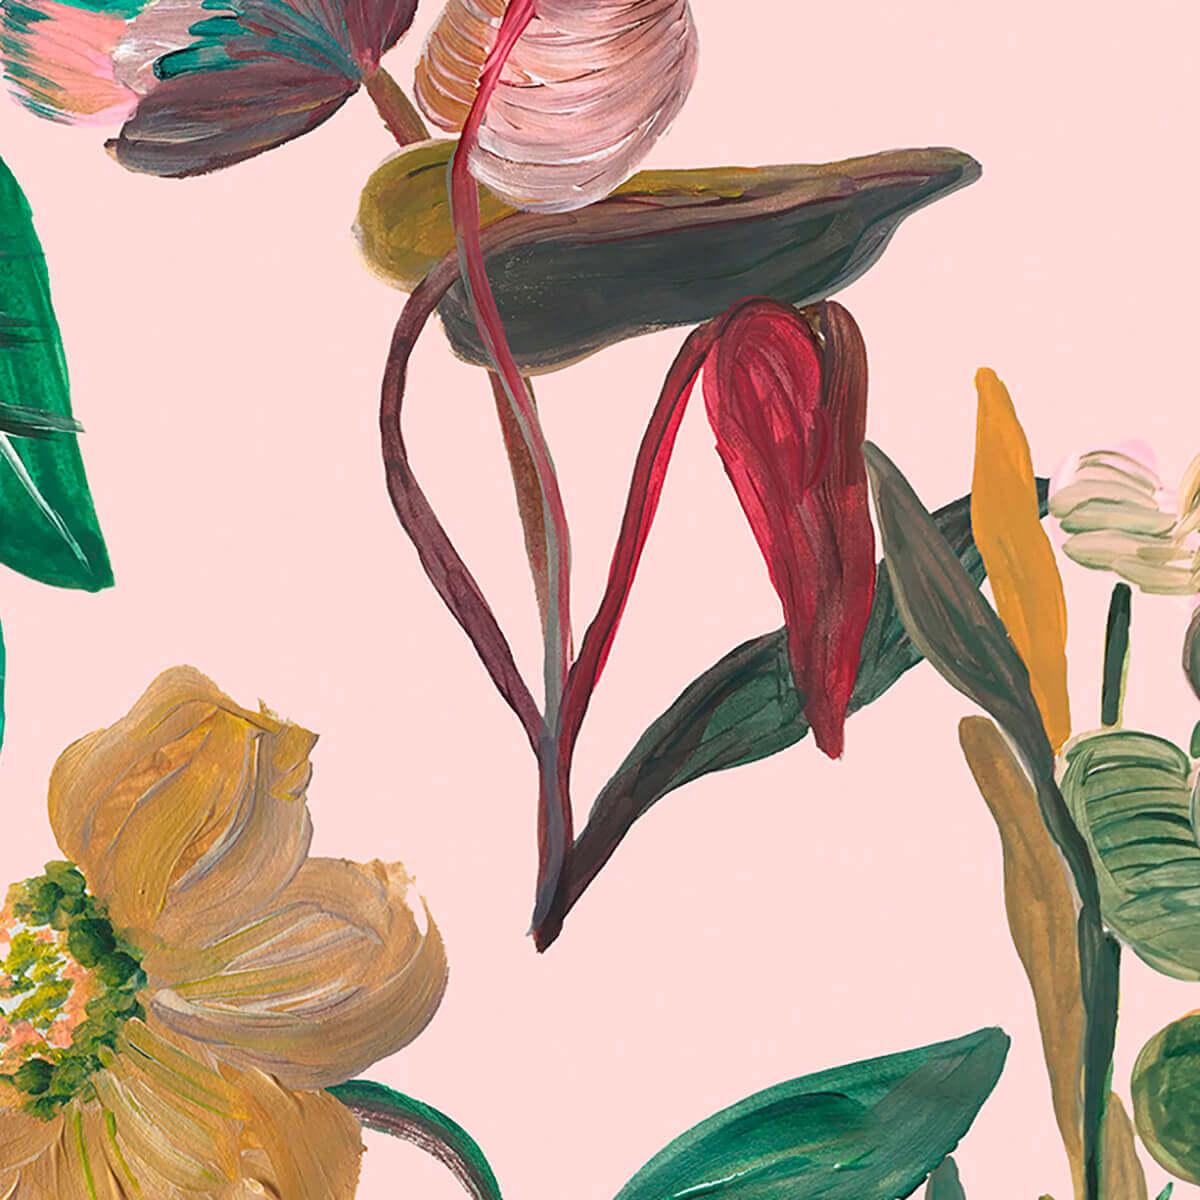 Papel de parede flores imaginárias | Pat Lobo